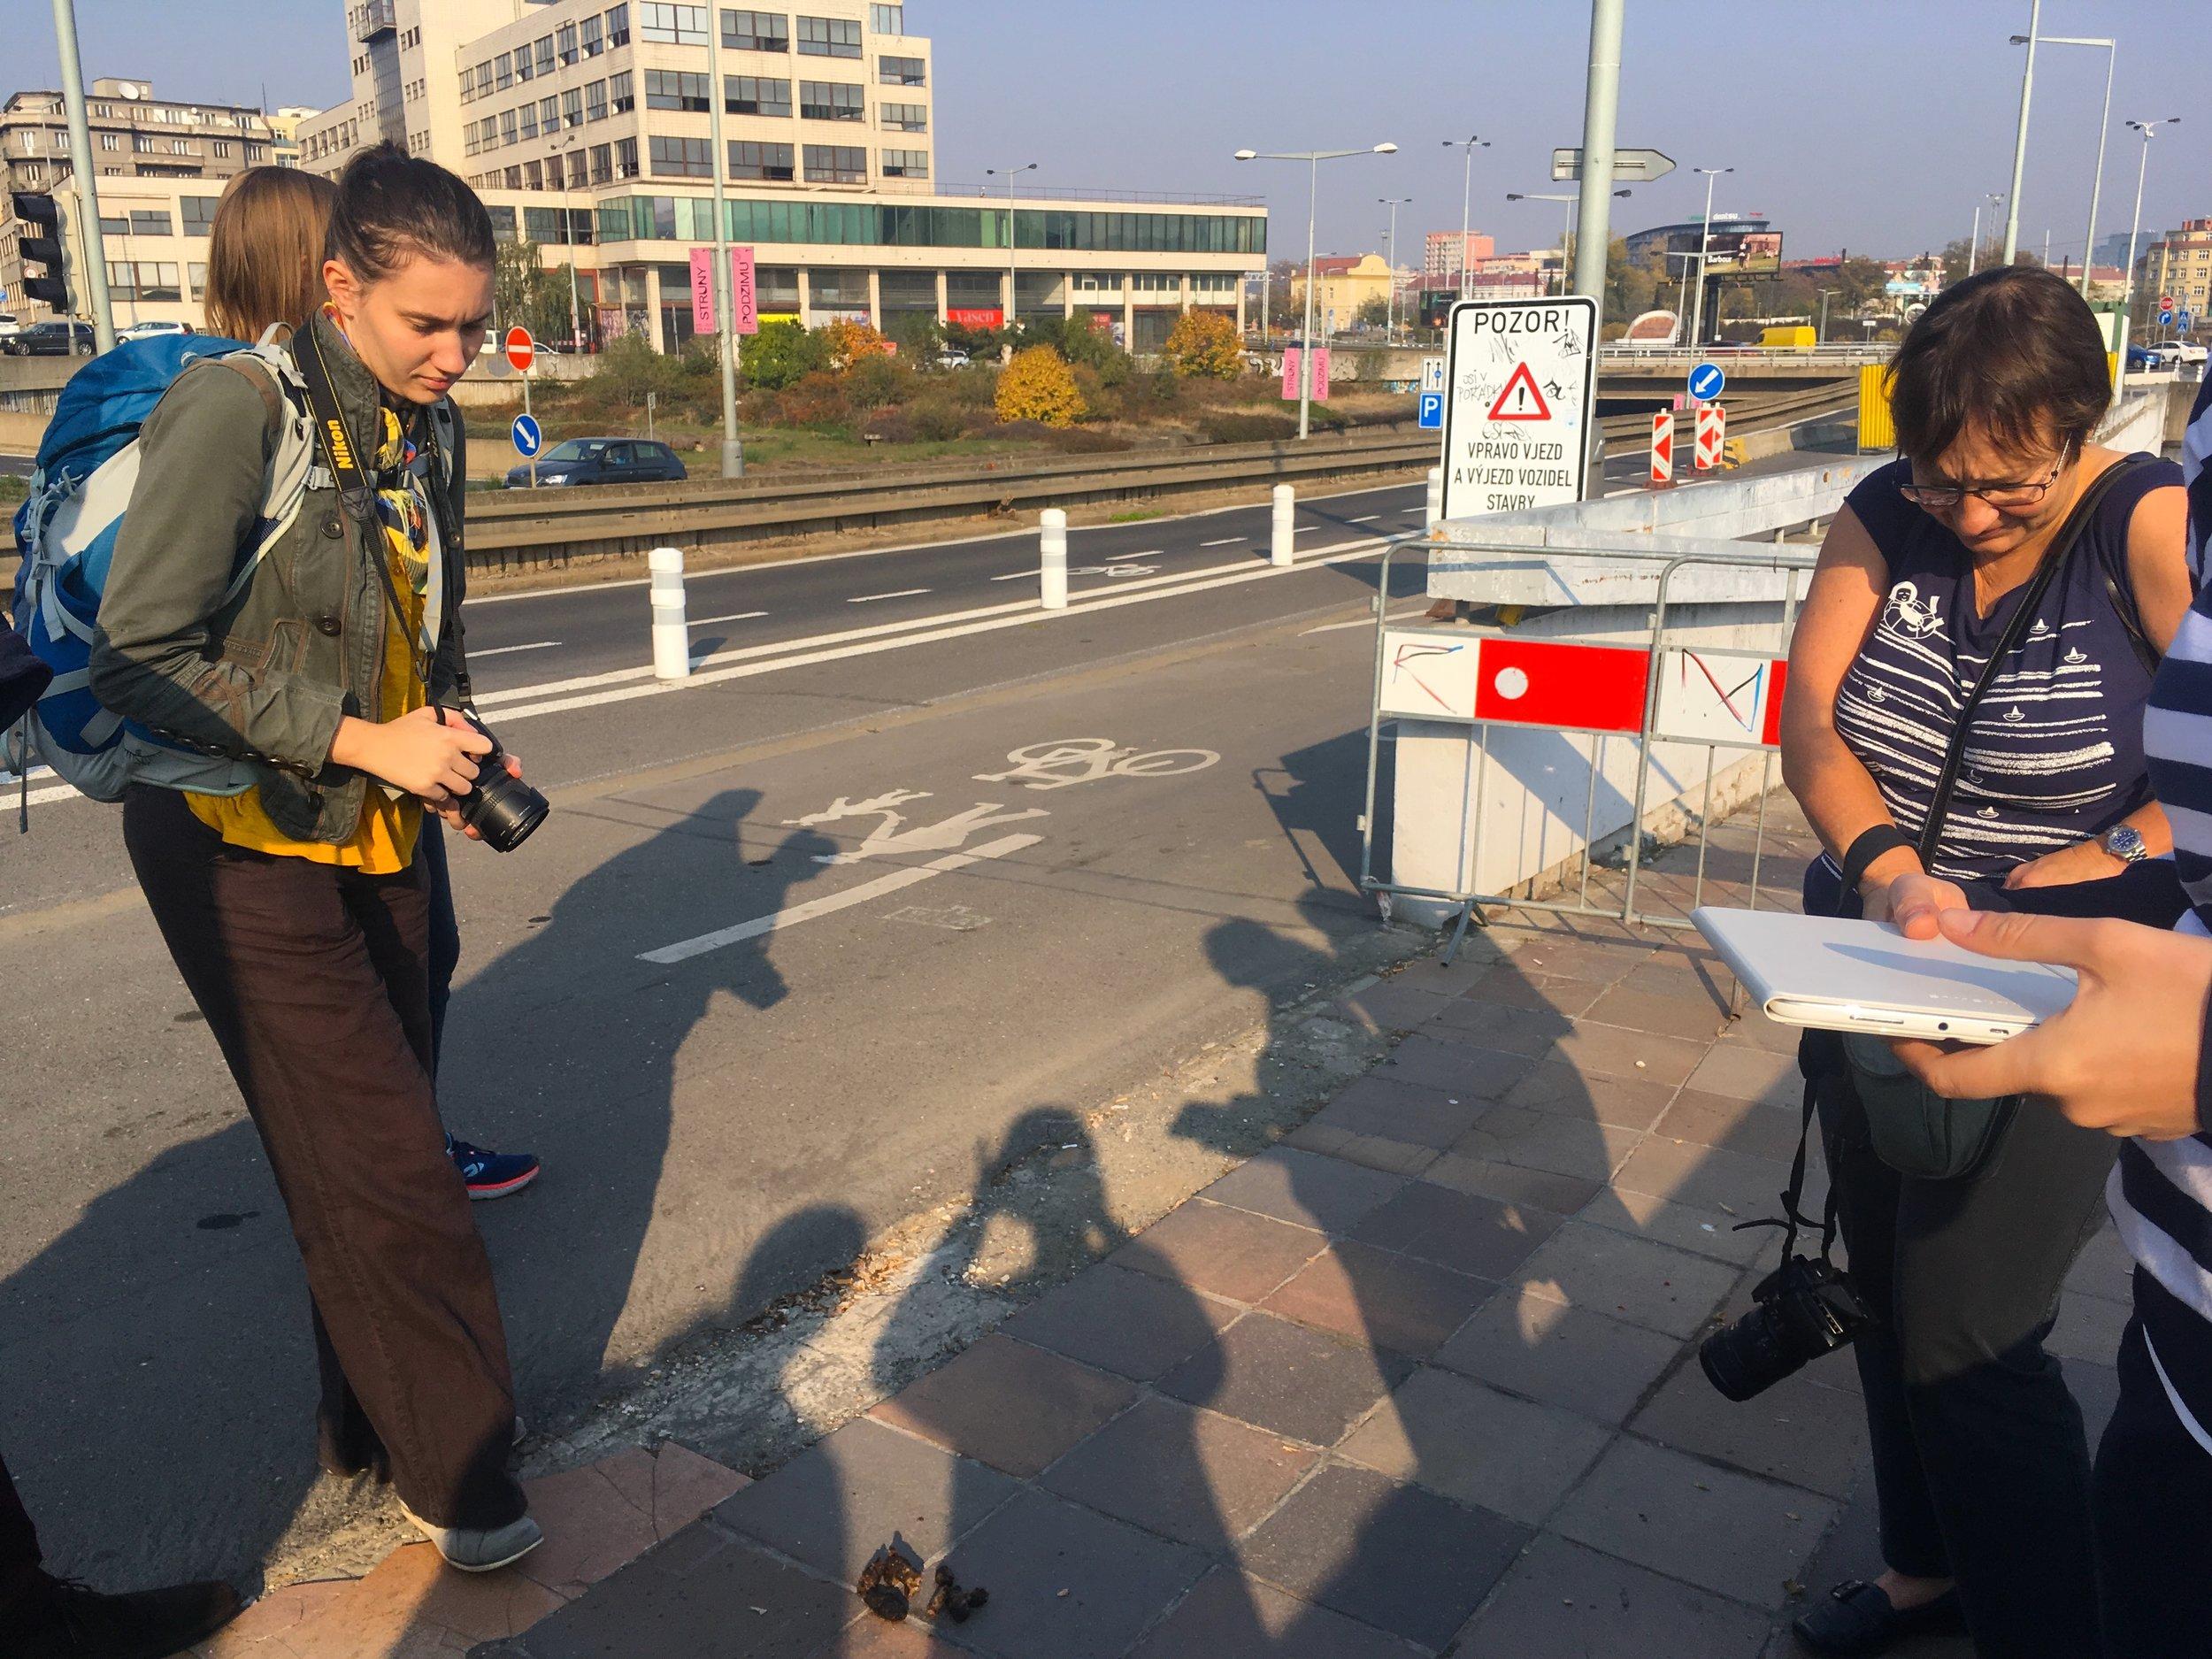 Reading inequalities of public space in Prague 7  photo (c) Milota Sidorova